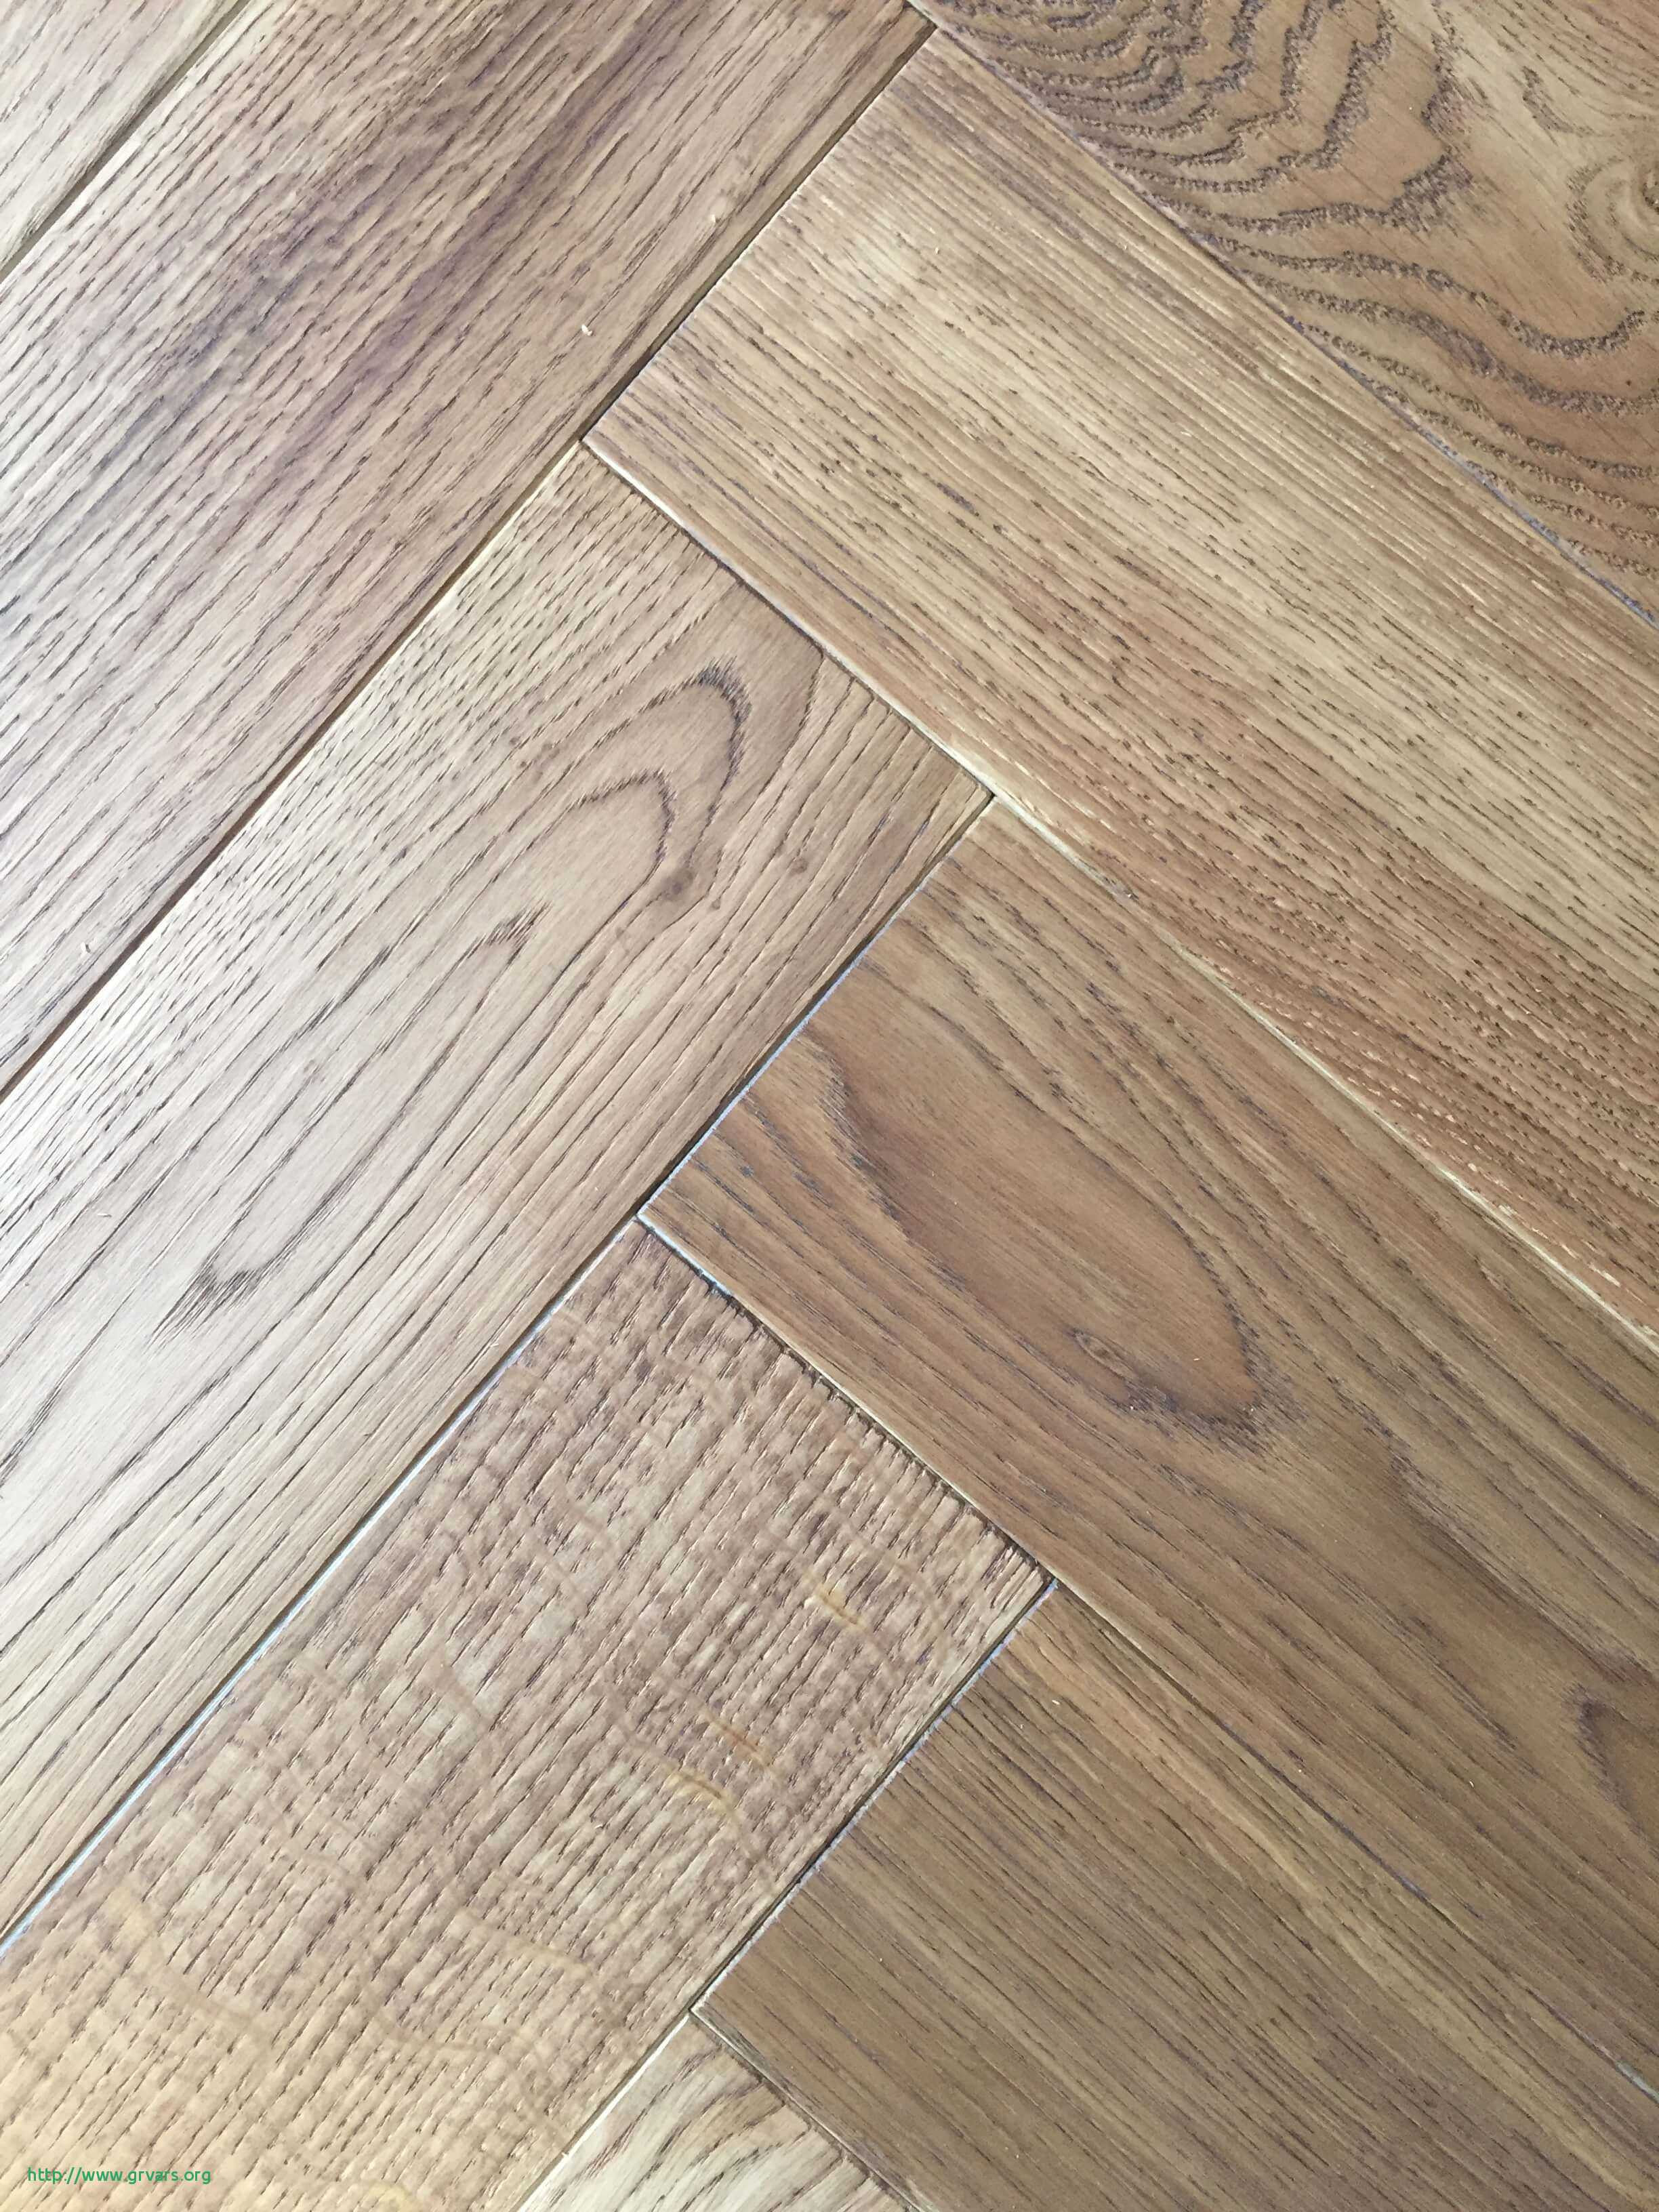 hardwood floor supply of 21 meilleur de what is better laminate or vinyl flooring ideas blog regarding 21 photos of the 21 meilleur de what is better laminate or vinyl flooring